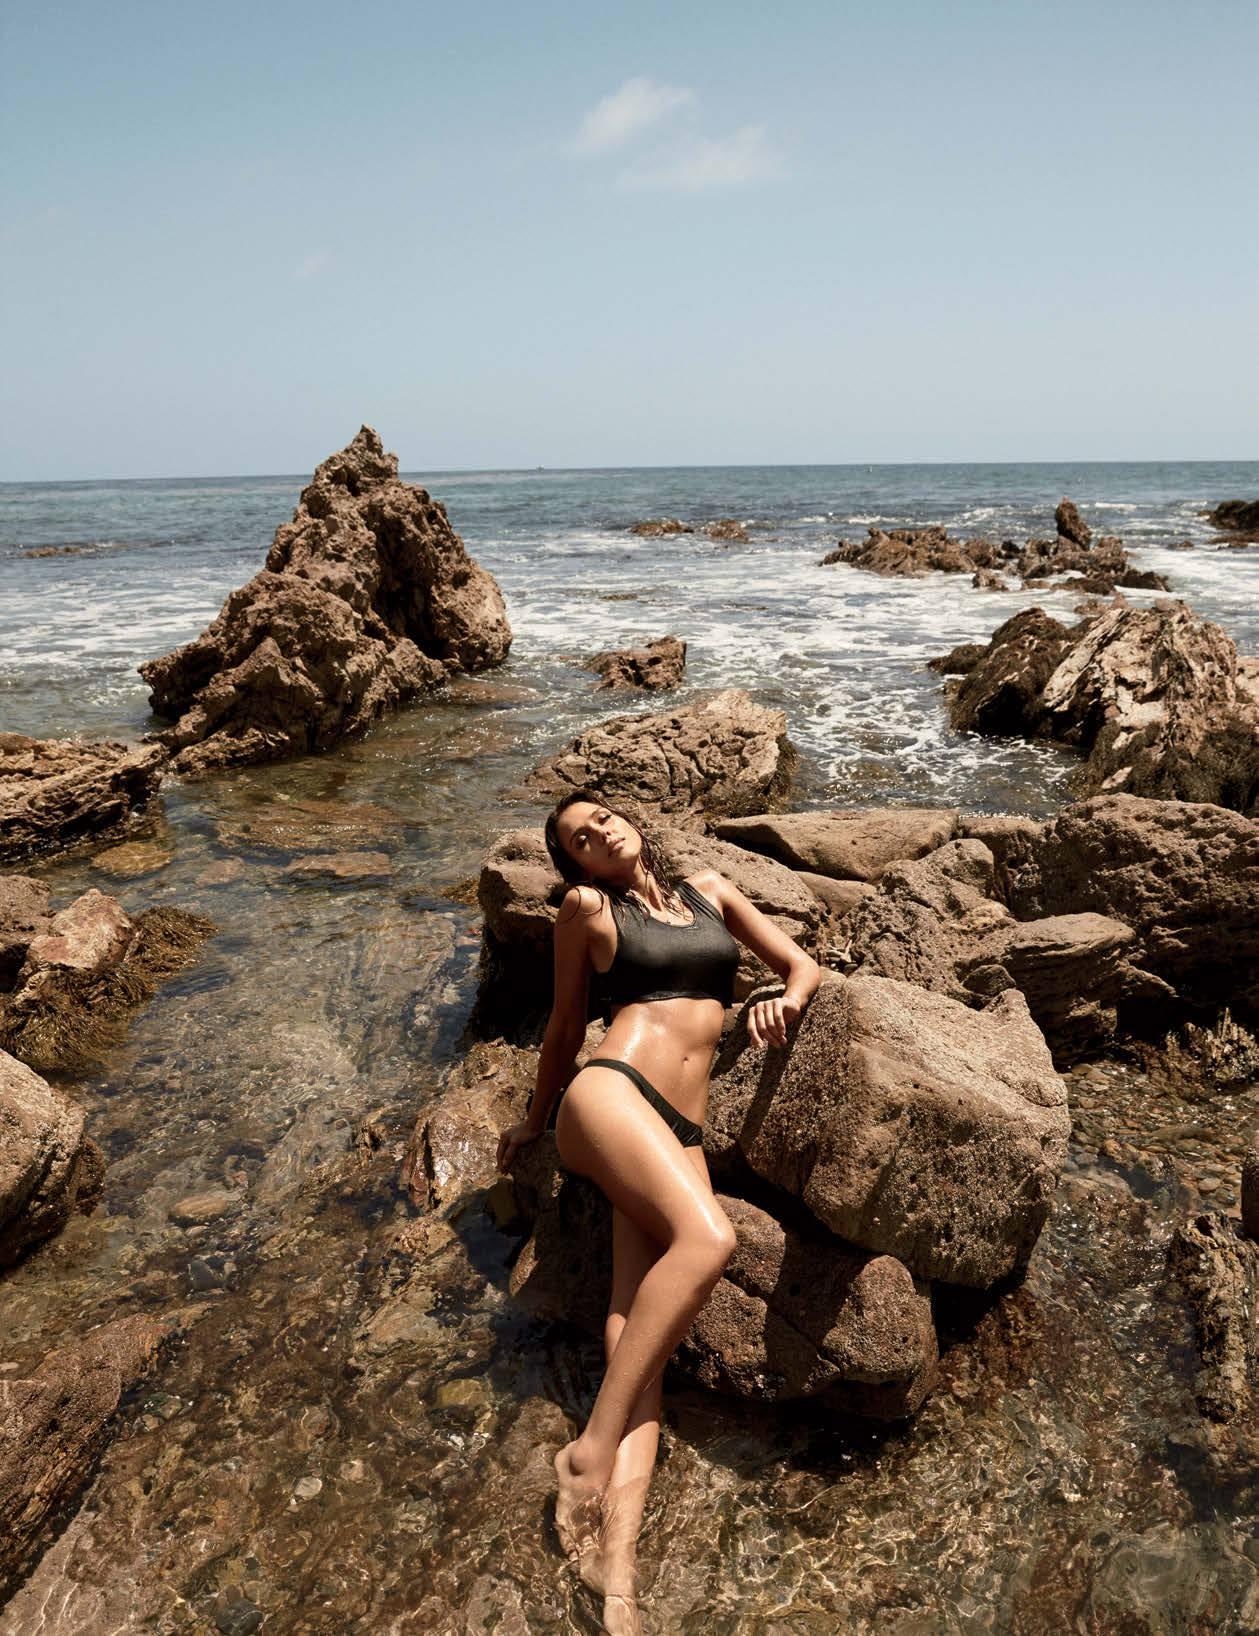 Jessica Alba – Beautiful Body In Sexy Photoshoot For Maxim Magazine (september 2014) (hq) 0013